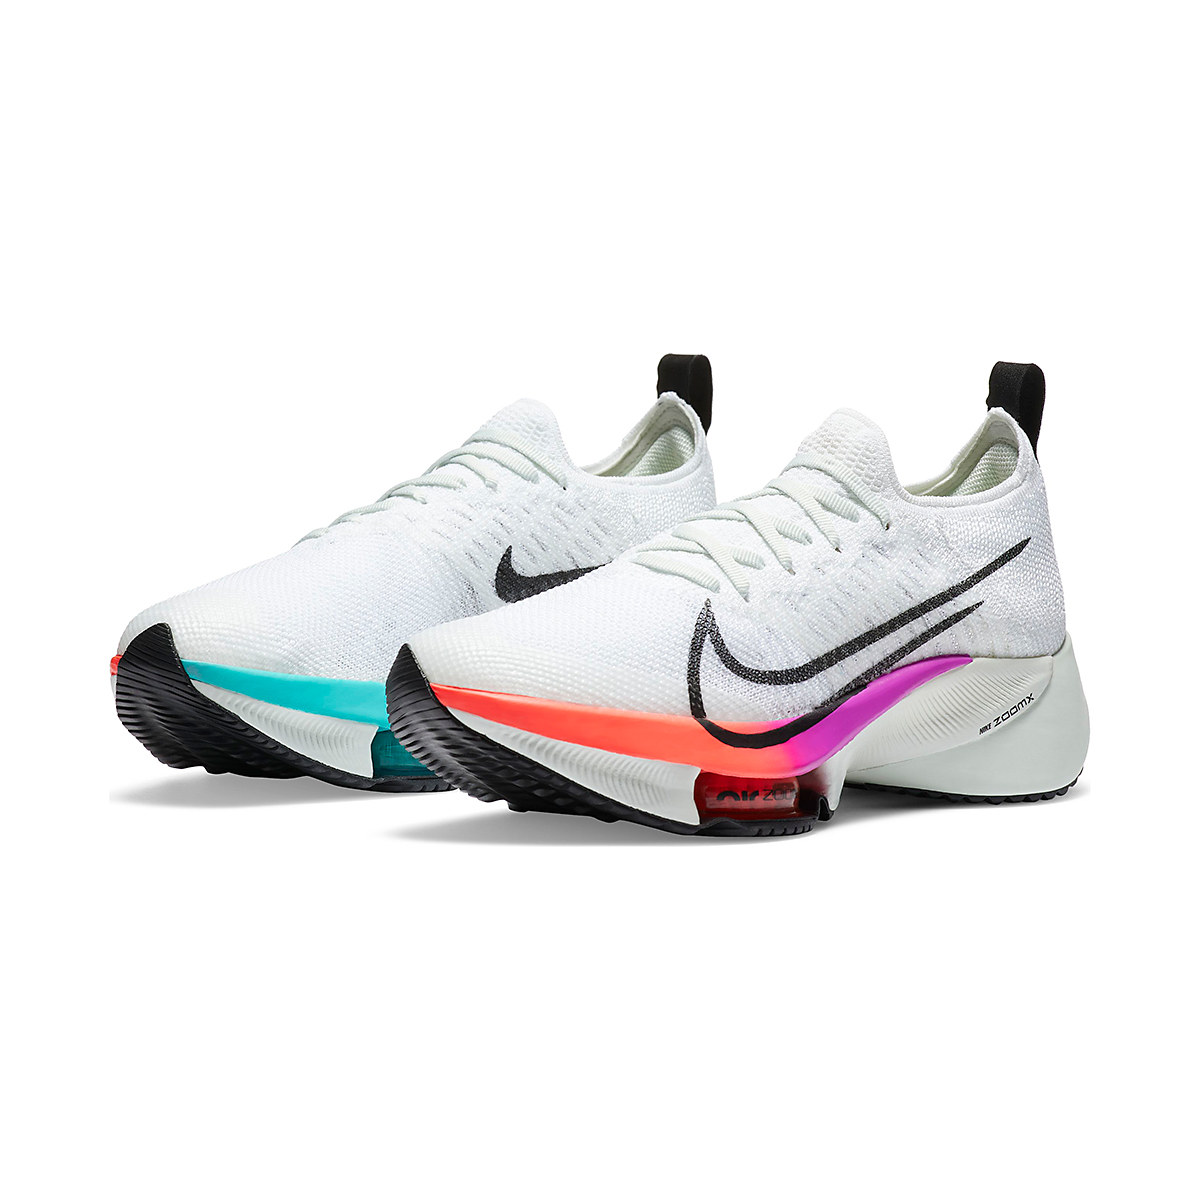 Women's Nike Air Zoom Tempo NEXT% Running Shoe - Color: White/Black-Hyper Violet-Flash Crimson  - Size: 5 - Width: Regular, White/Black-Hyper Violet-Flash Crimson, large, image 4